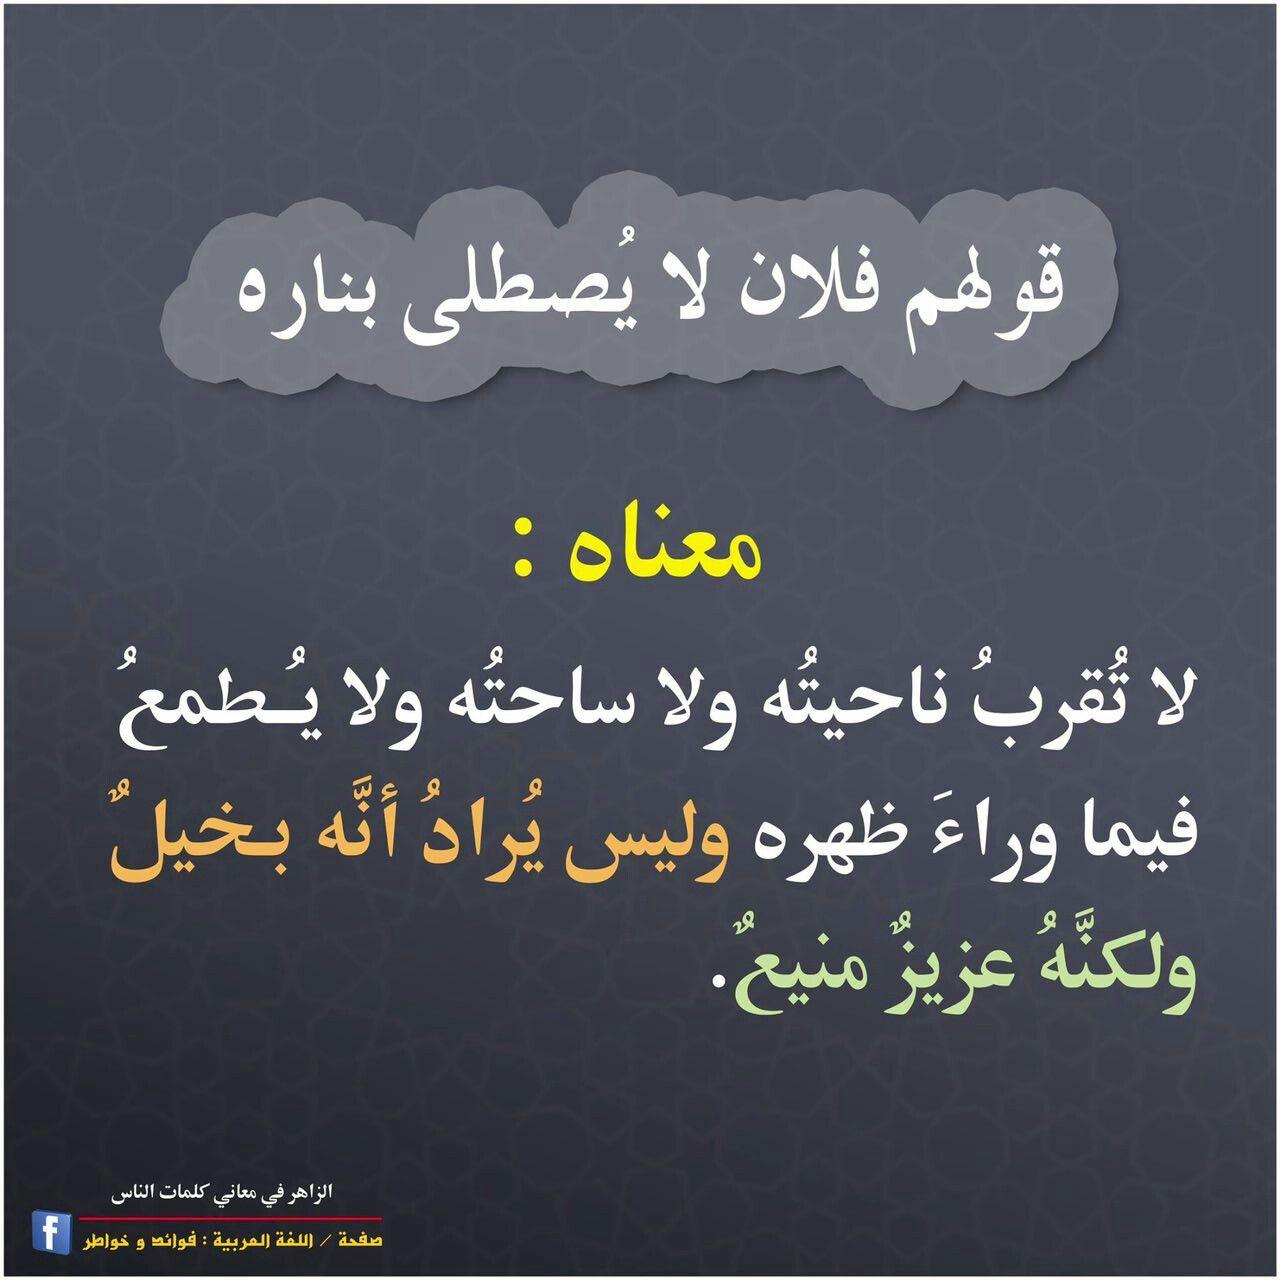 معنى قولهم فلان لا يصطلى بناره Beautiful Arabic Words Learn Arabic Language Arabic Language